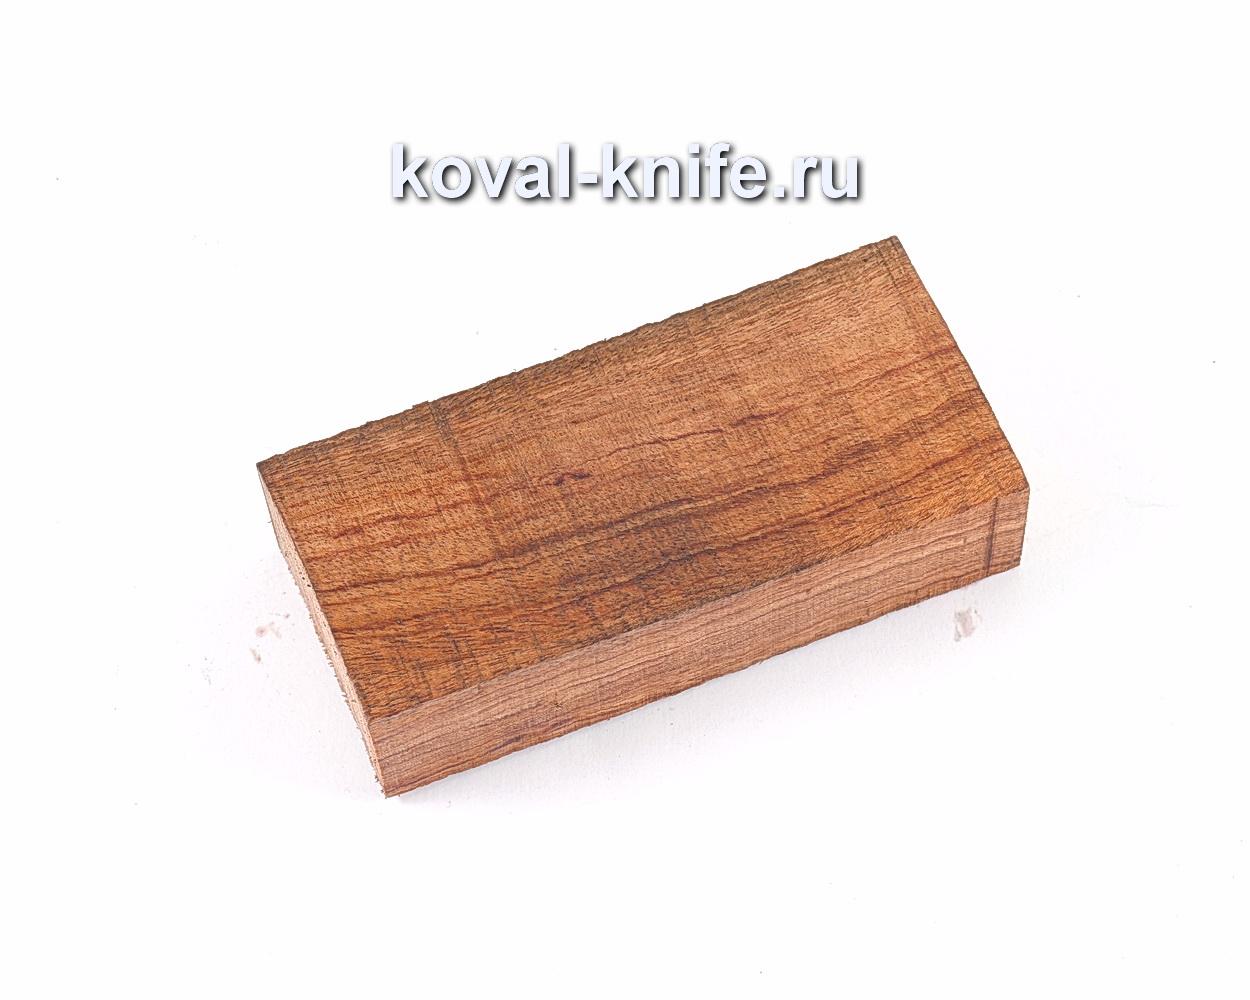 Брусок Бубинга для рукоятки ножа